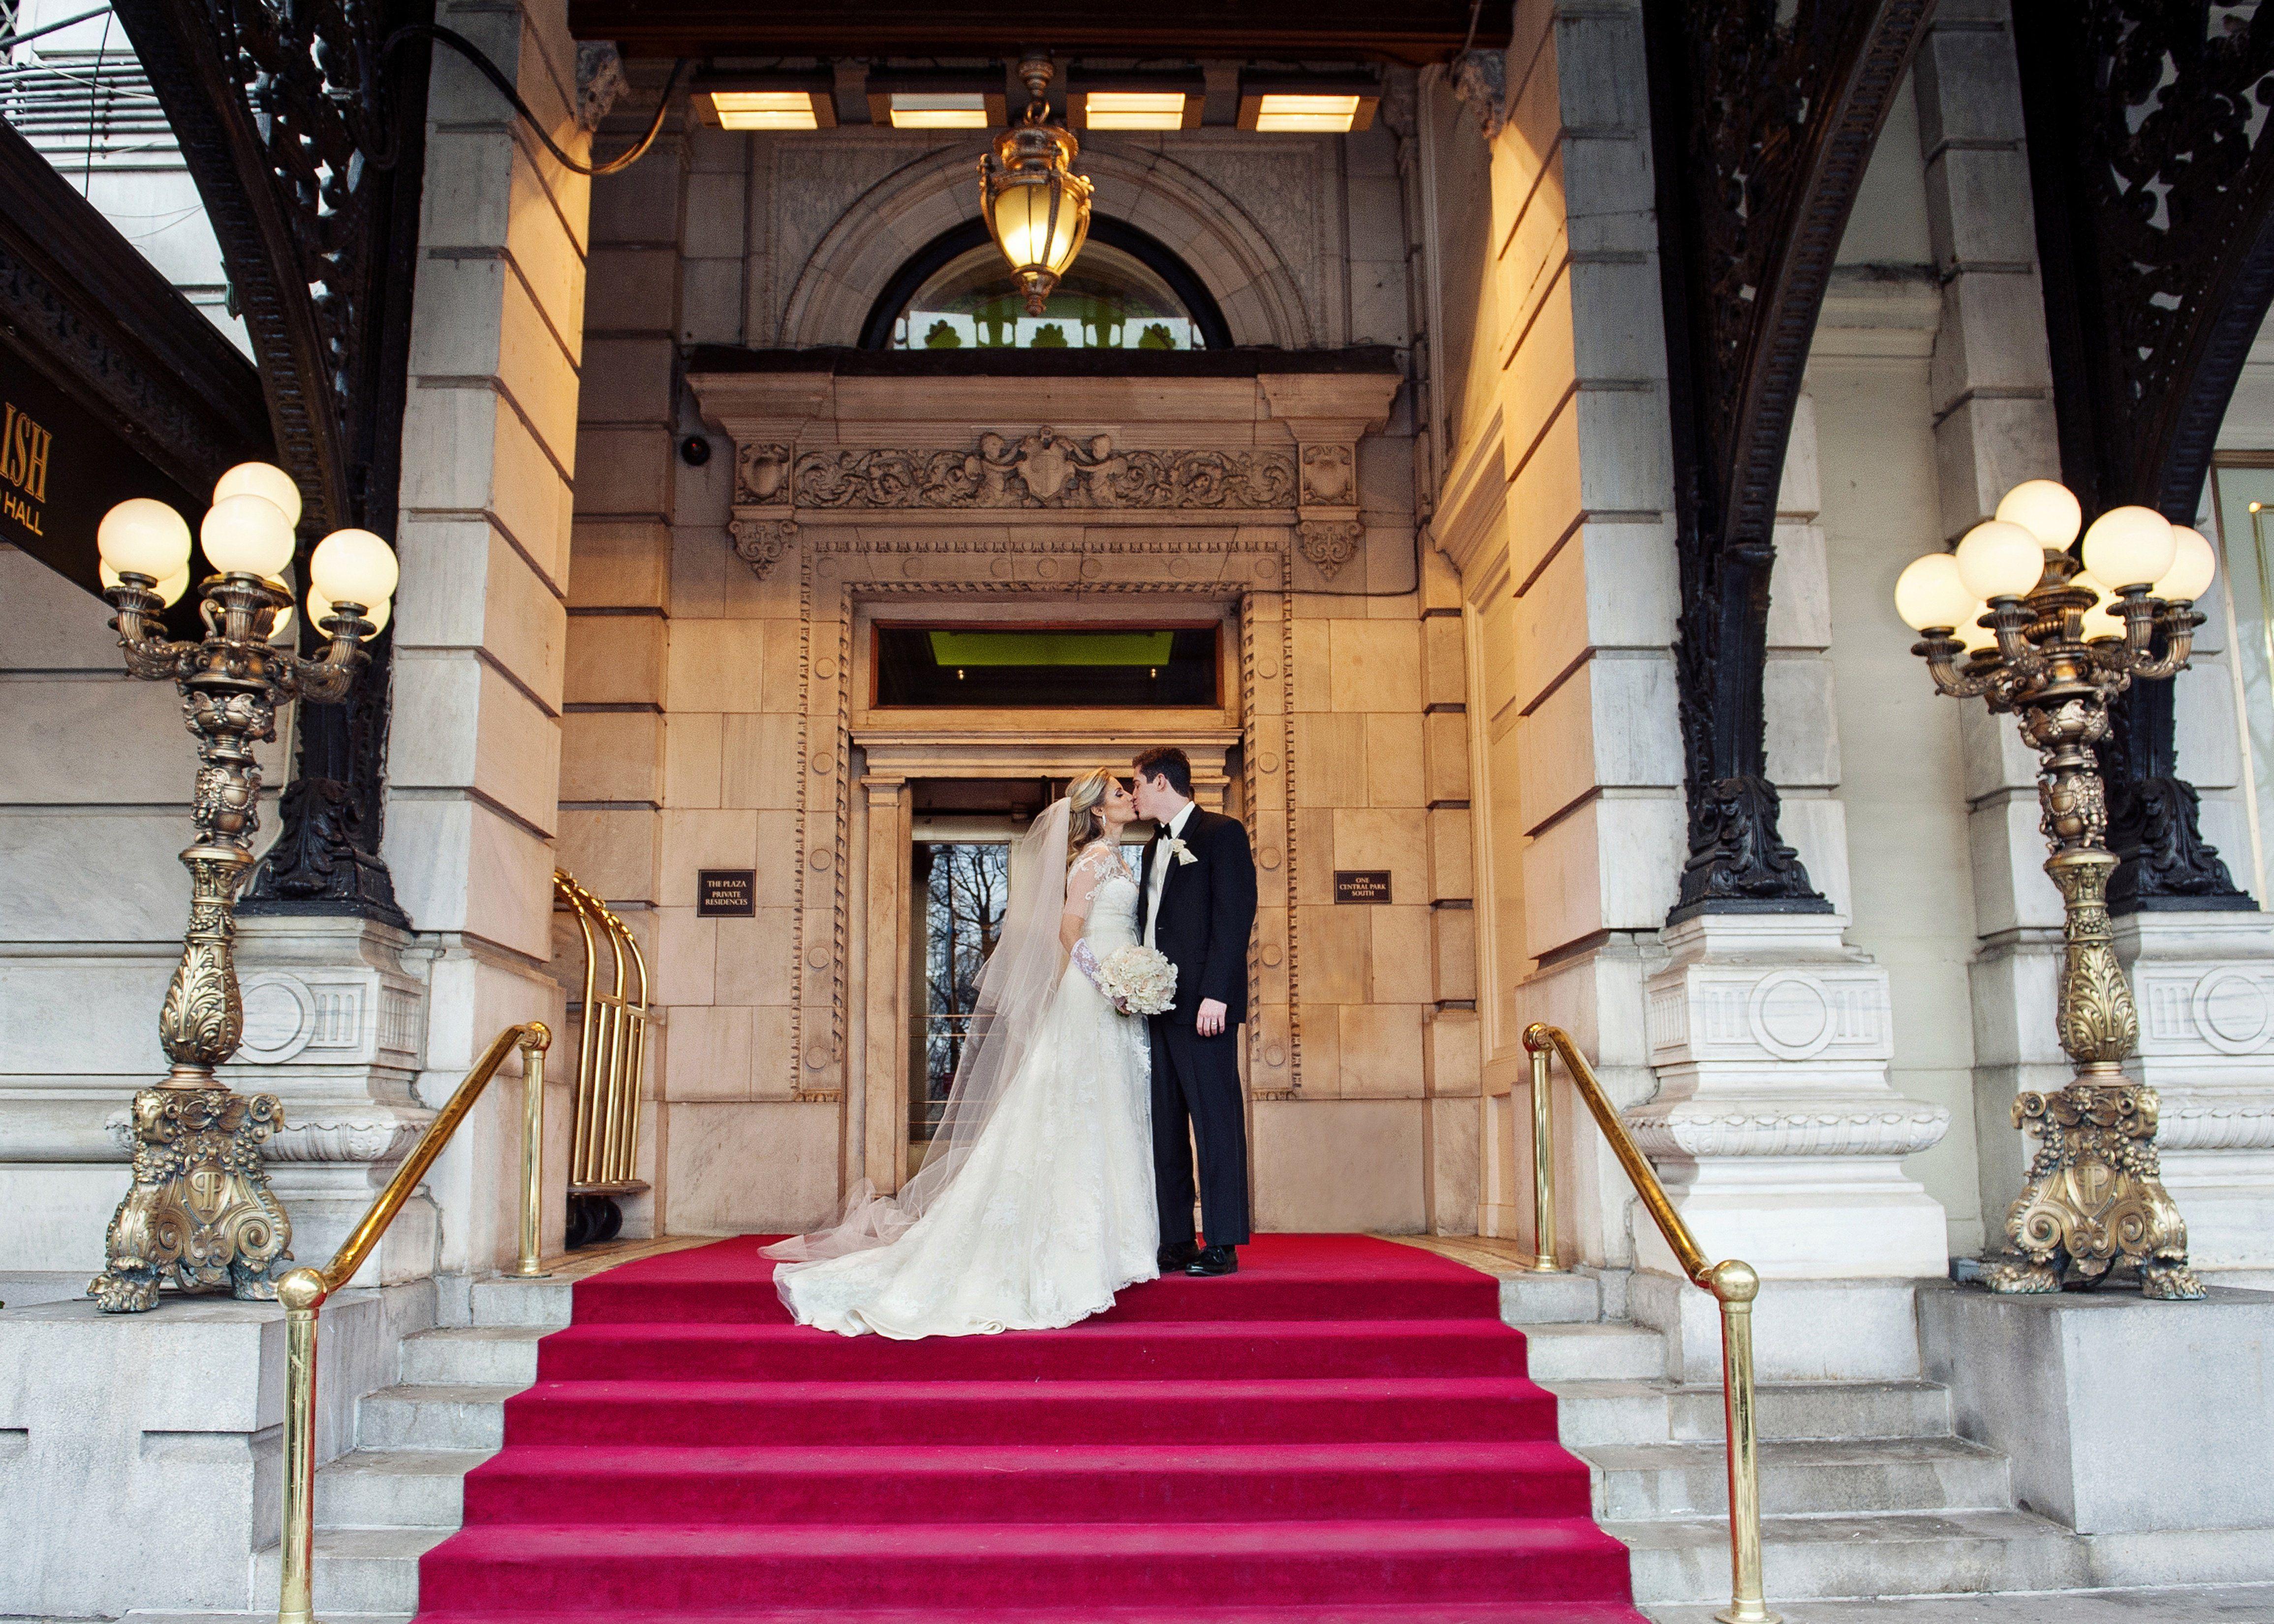 An Opulent Plaza Hotel Wedding Plaza Hotel Wedding Plaza Hotel Hotel Wedding